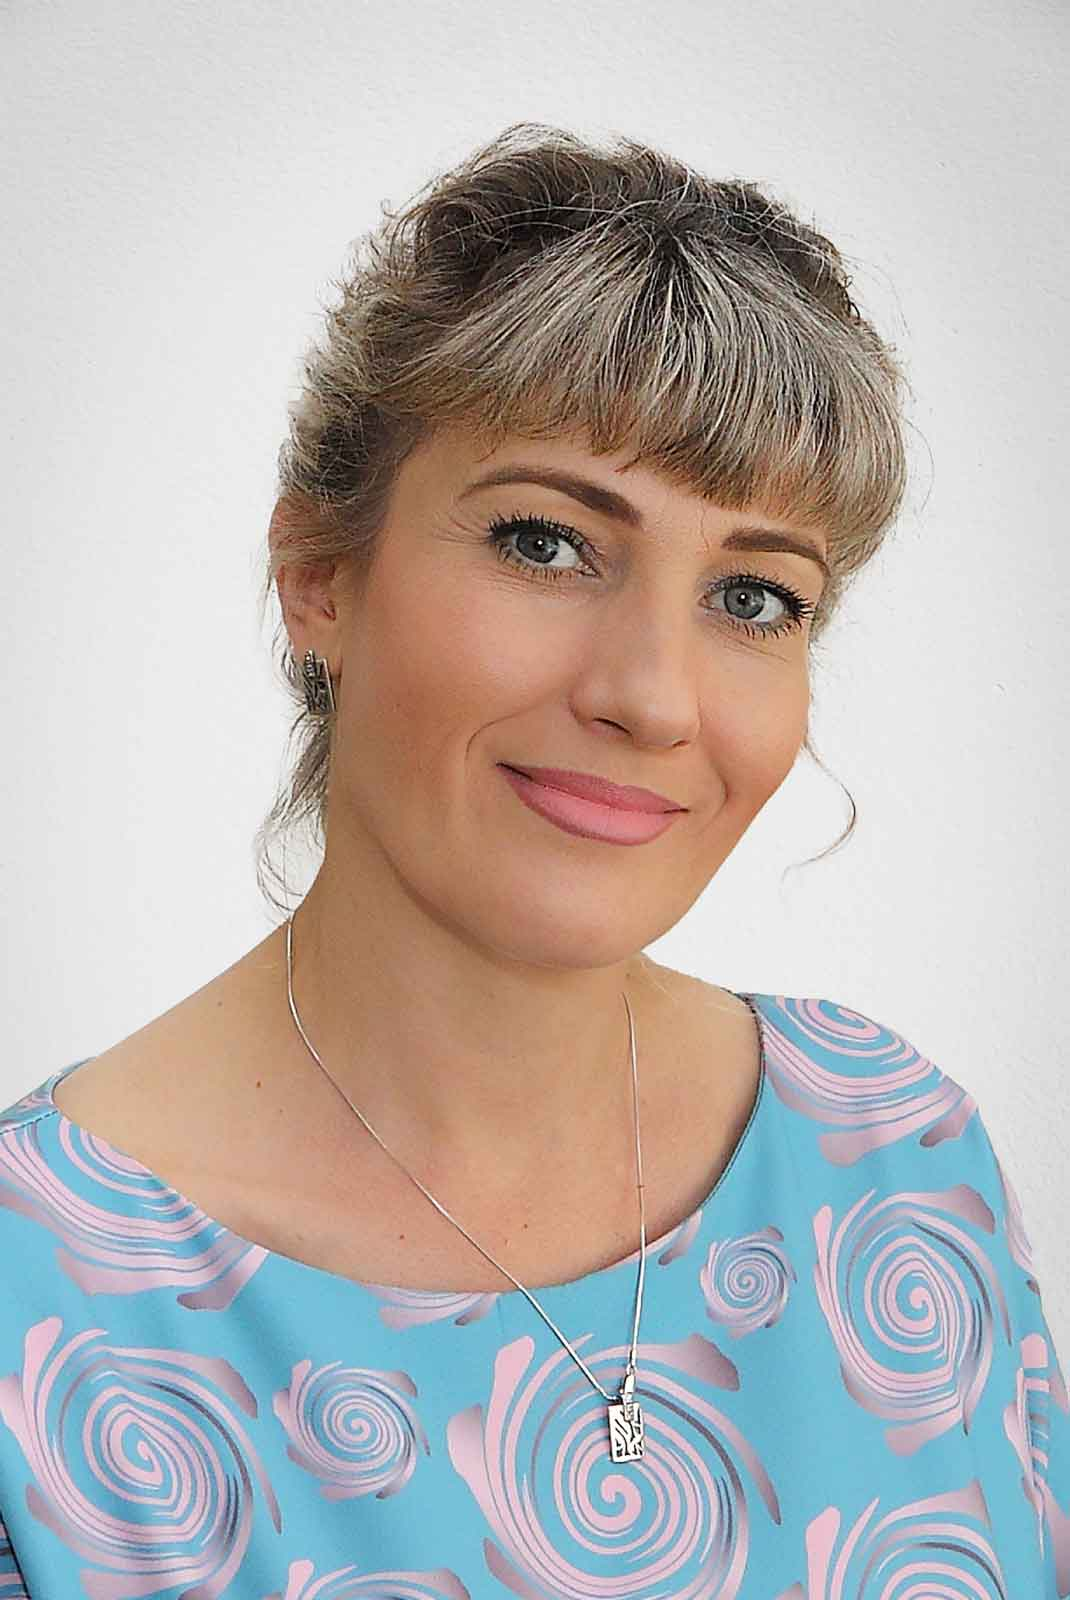 Бондаренко Виктория Витальевна